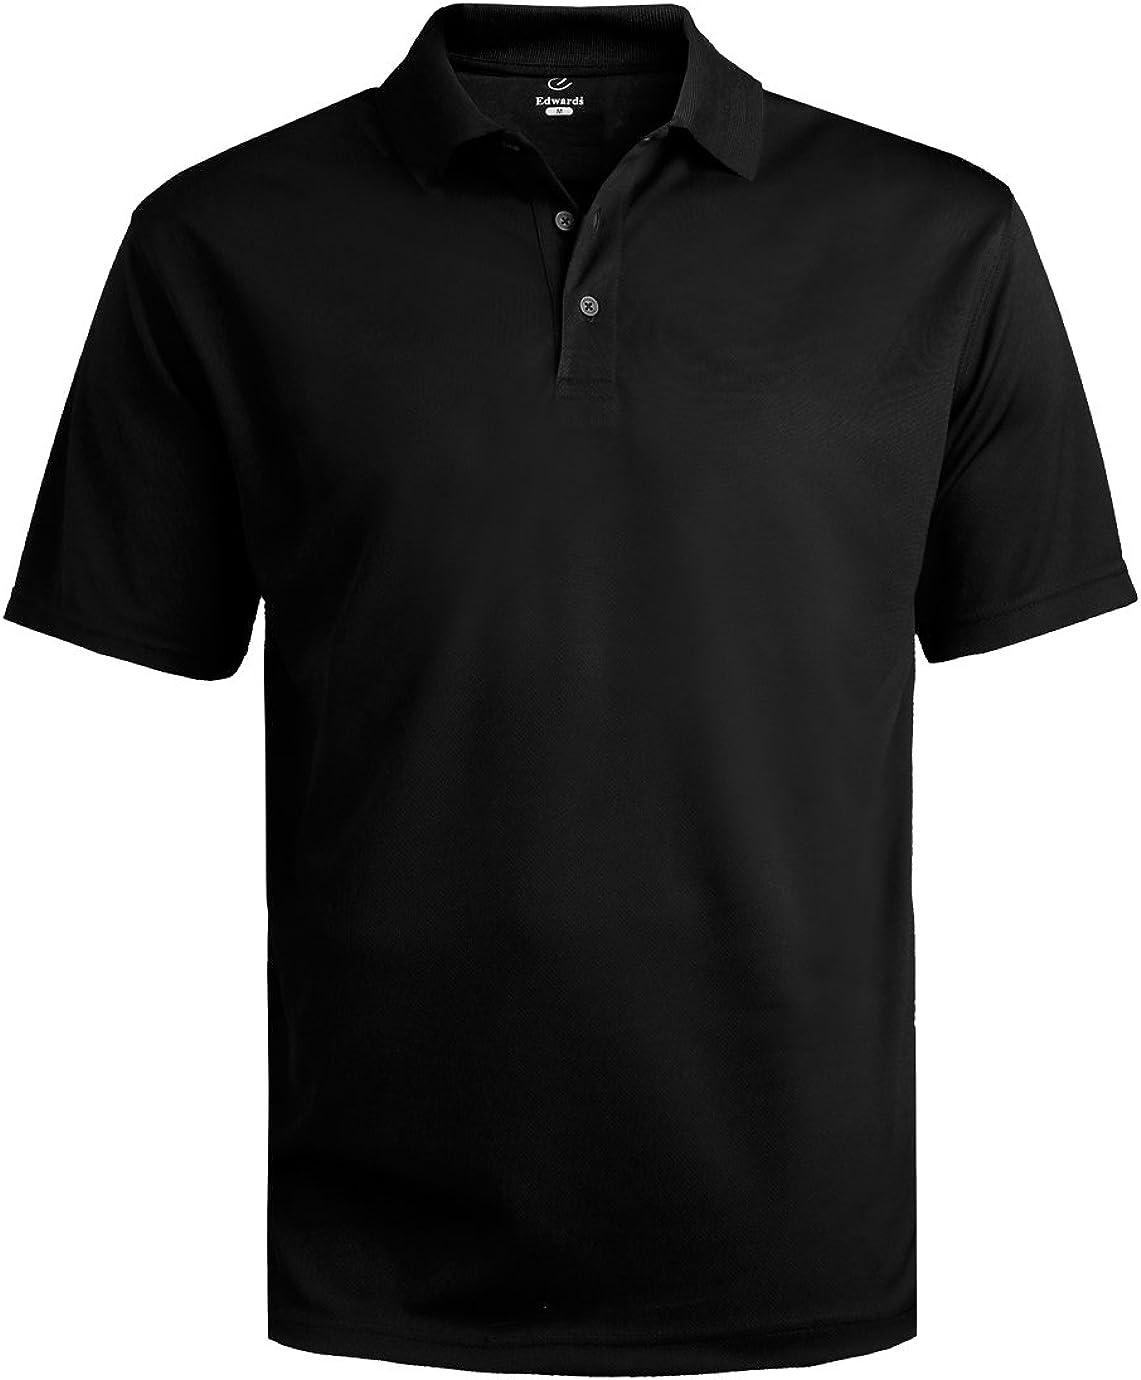 Edwards Garment Men's Big And Tall Dry-Mesh Hi-Performance Polo Shirt_BLACK_6XLT